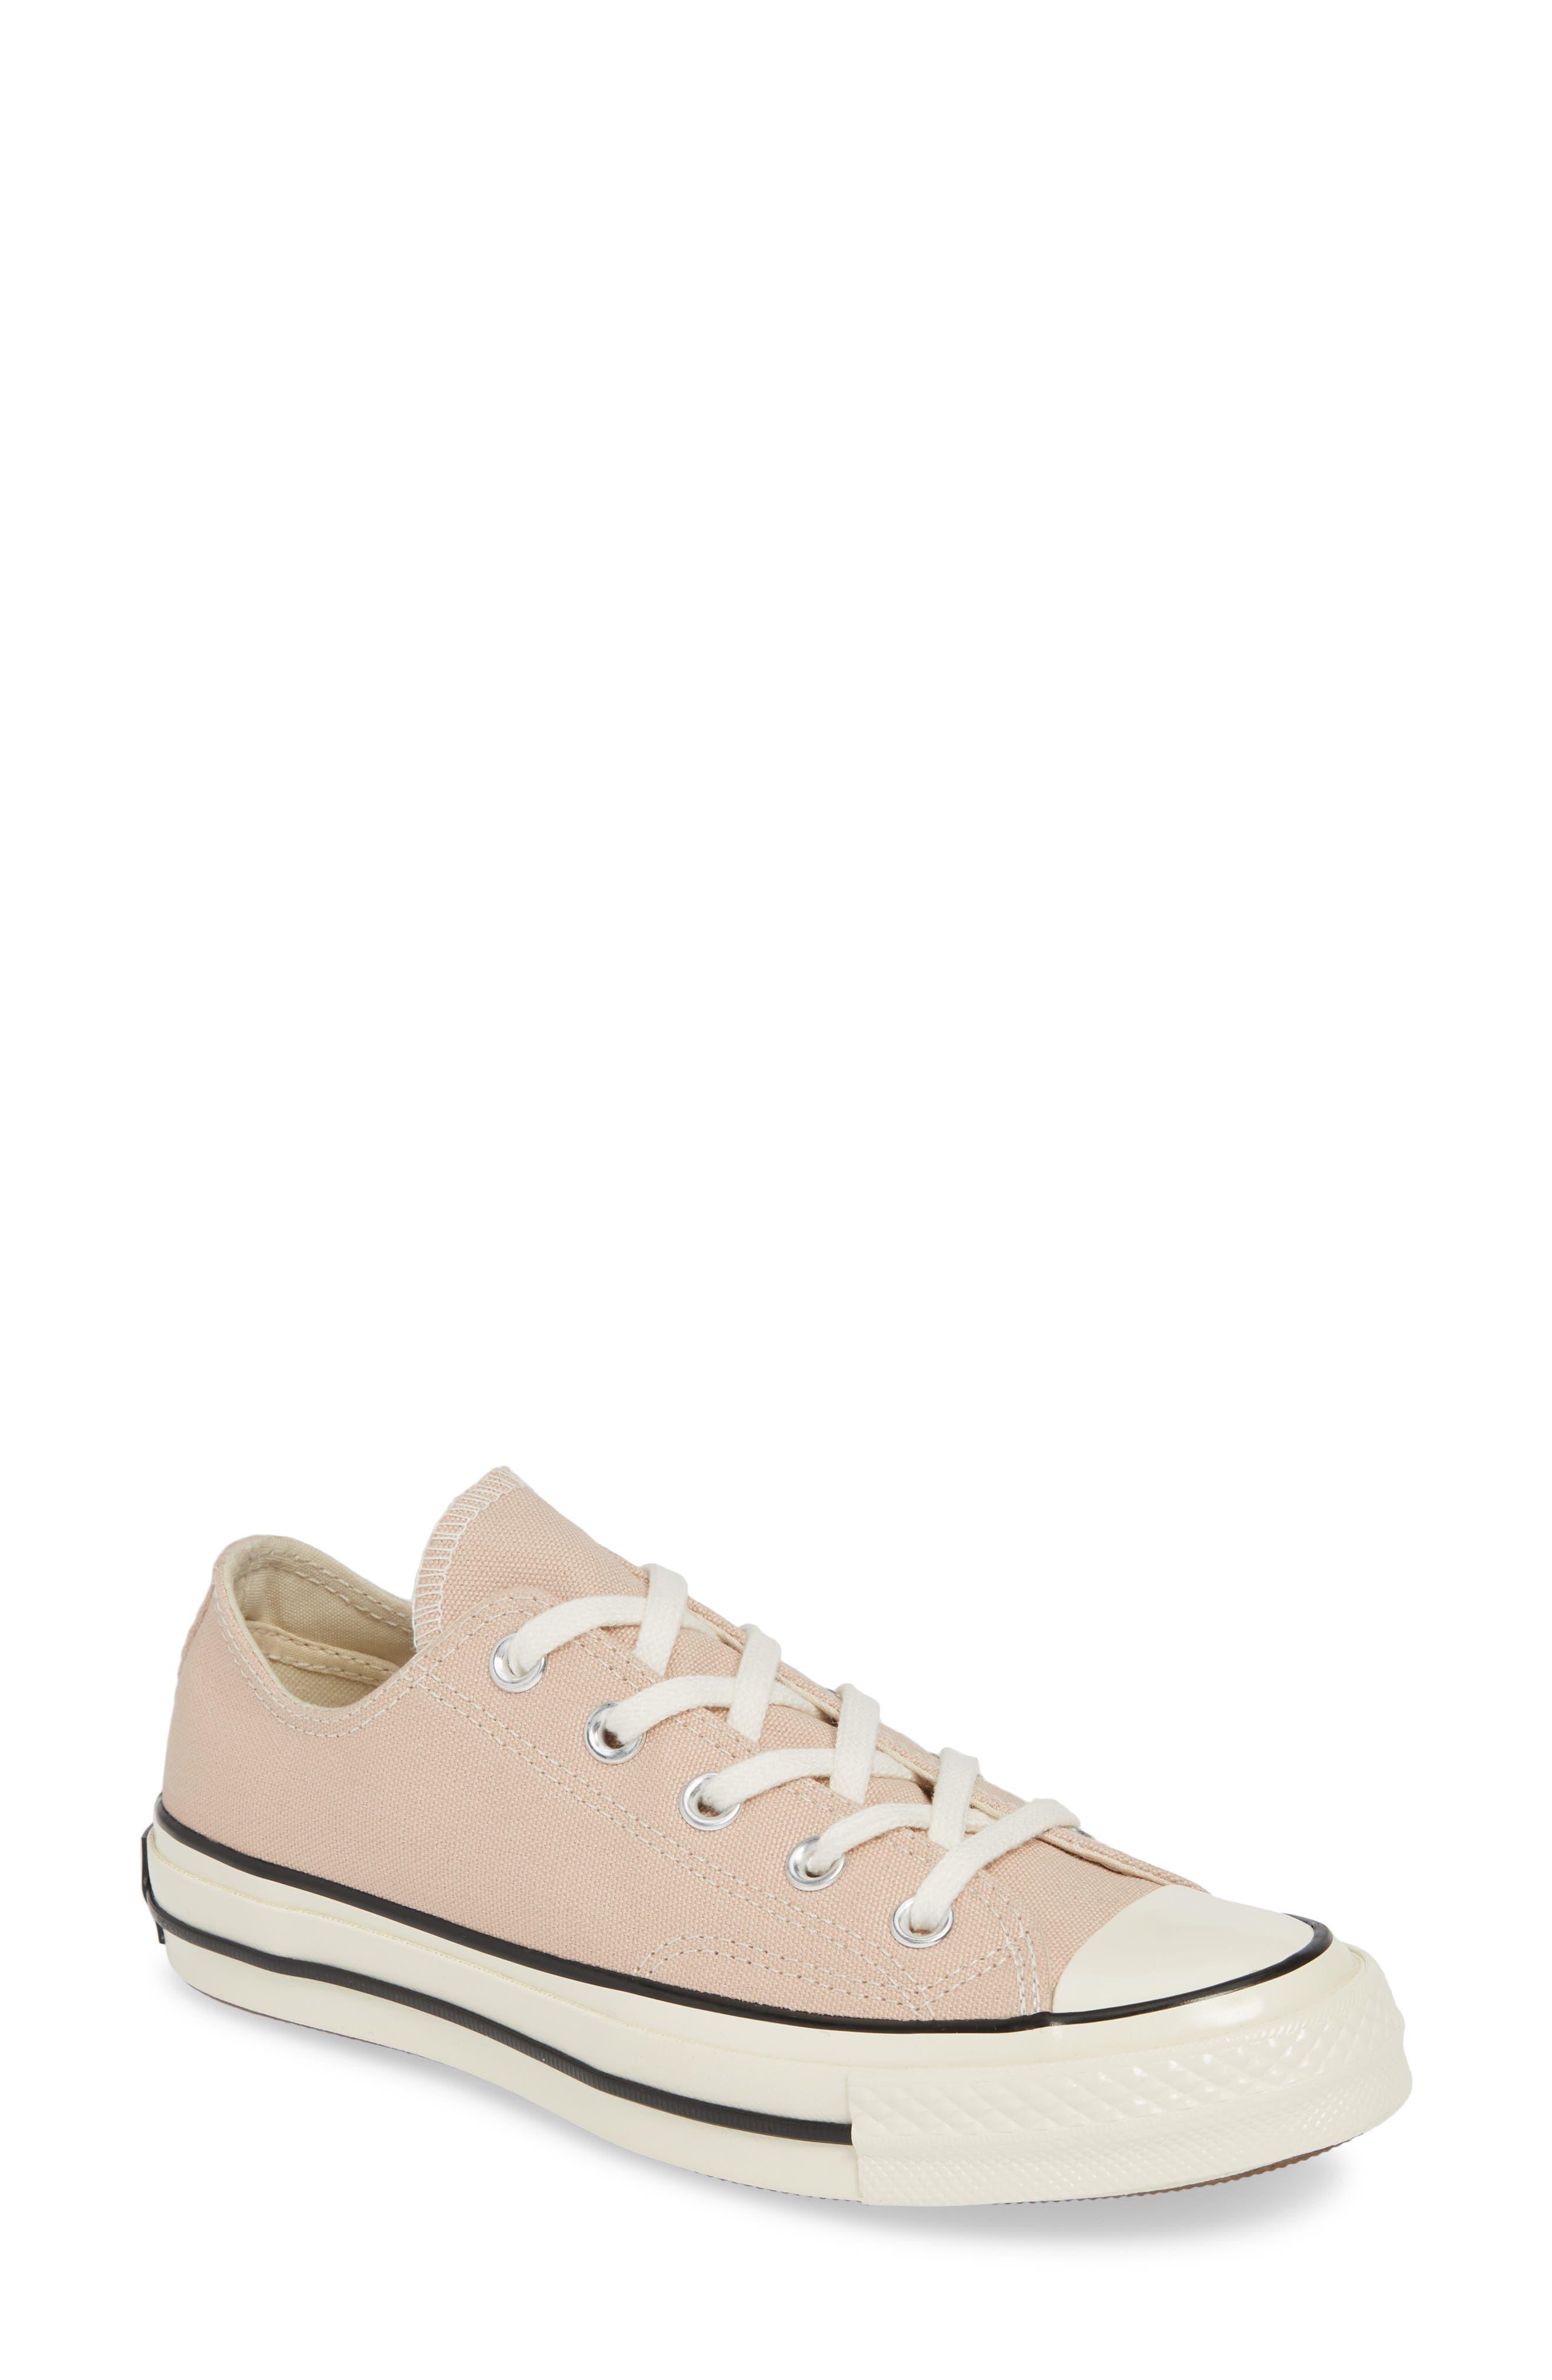 Converse Chuck Taylor All Star Chuck 70 Ox Sneaker